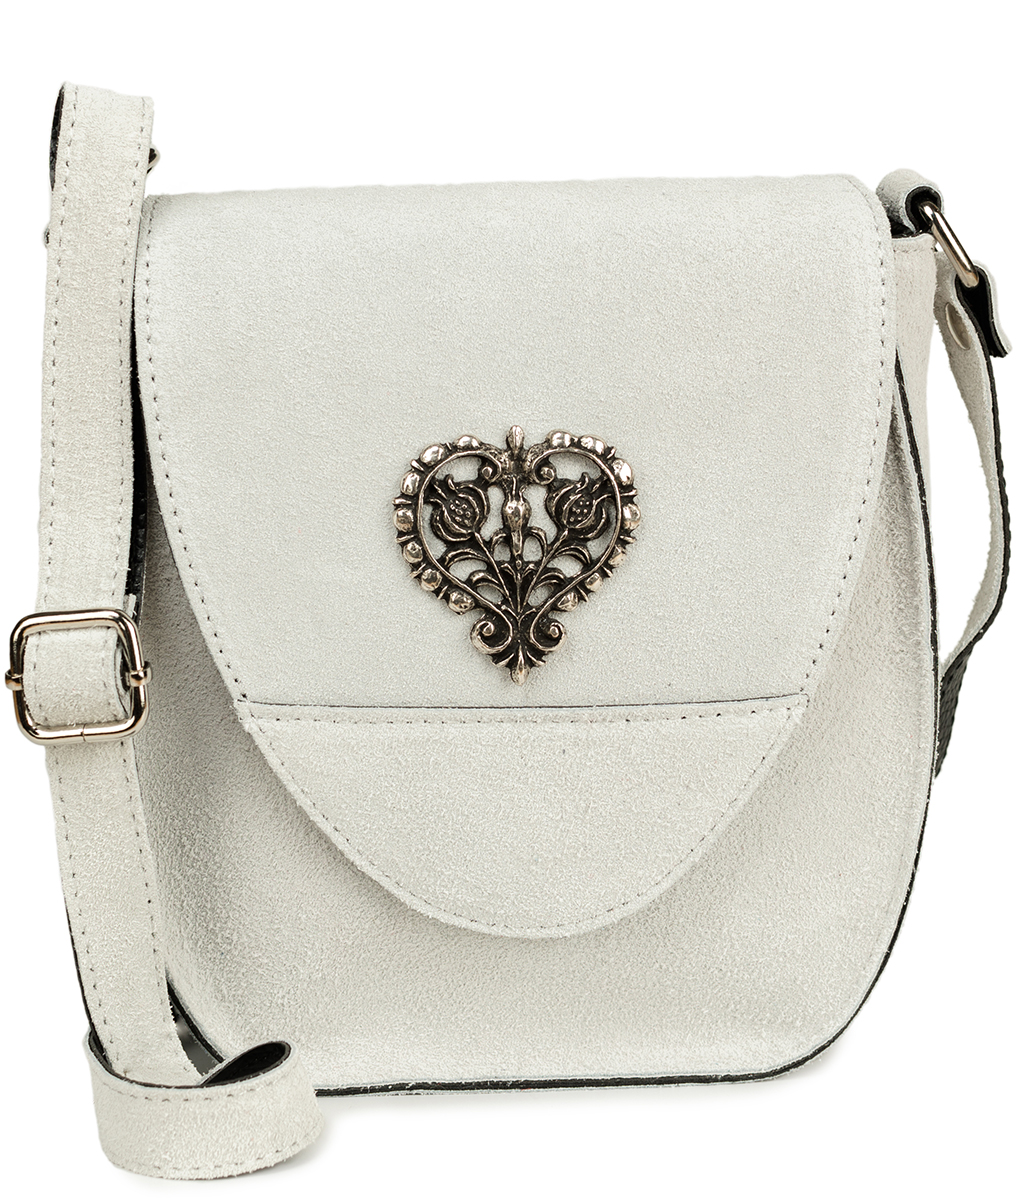 Traditional leather bag with heart TA30410-8525 white von Schuhmacher